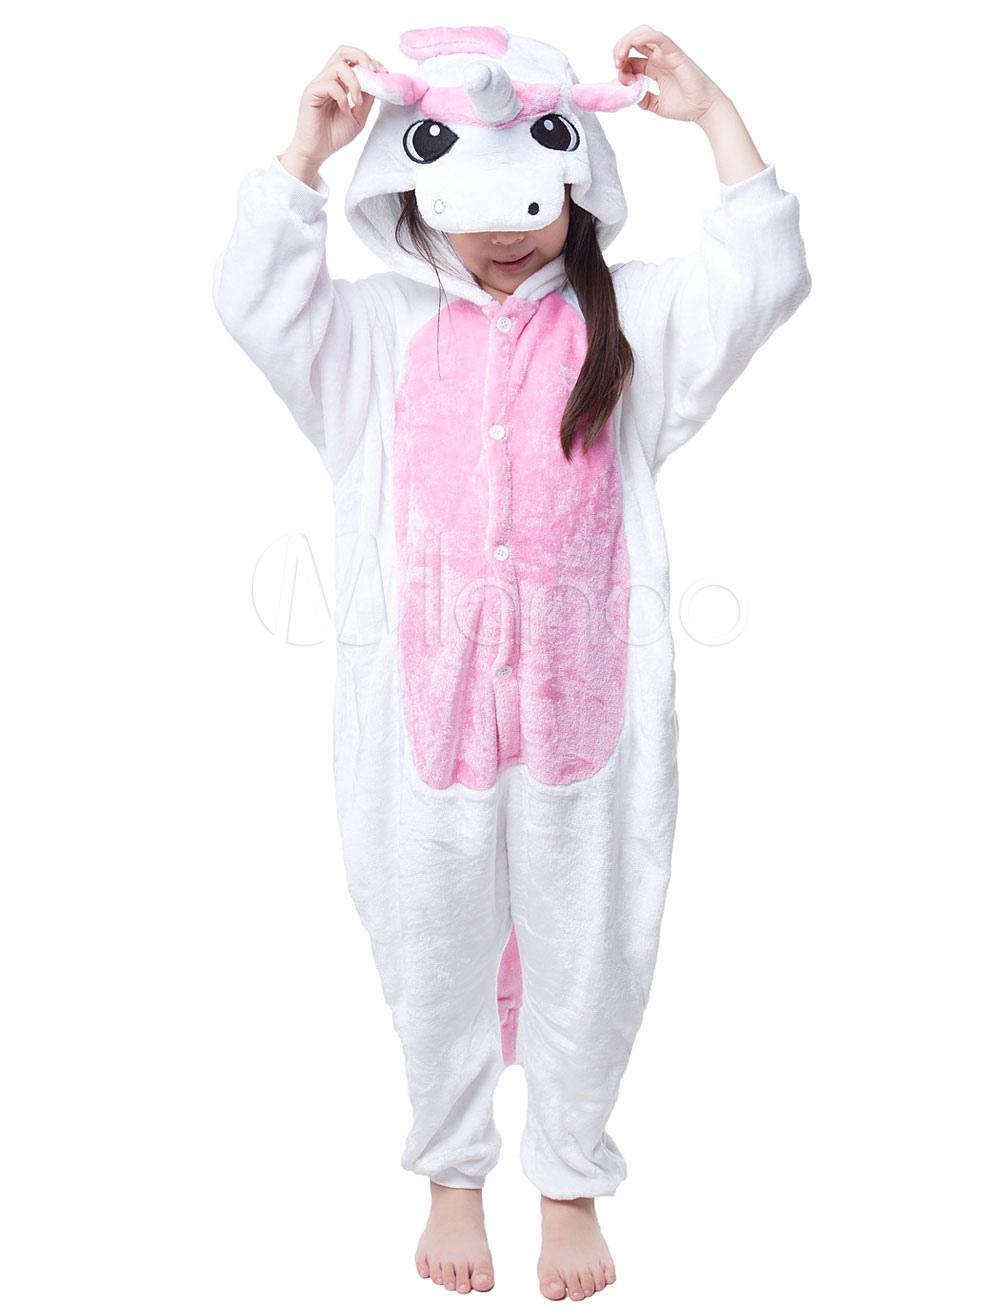 Buy Kigurumi Pajama Licorne Unicorn Onesie For Kids Pink Synthetic Jumpsuit Mascot Costume Halloween for $16.79 in Milanoo store